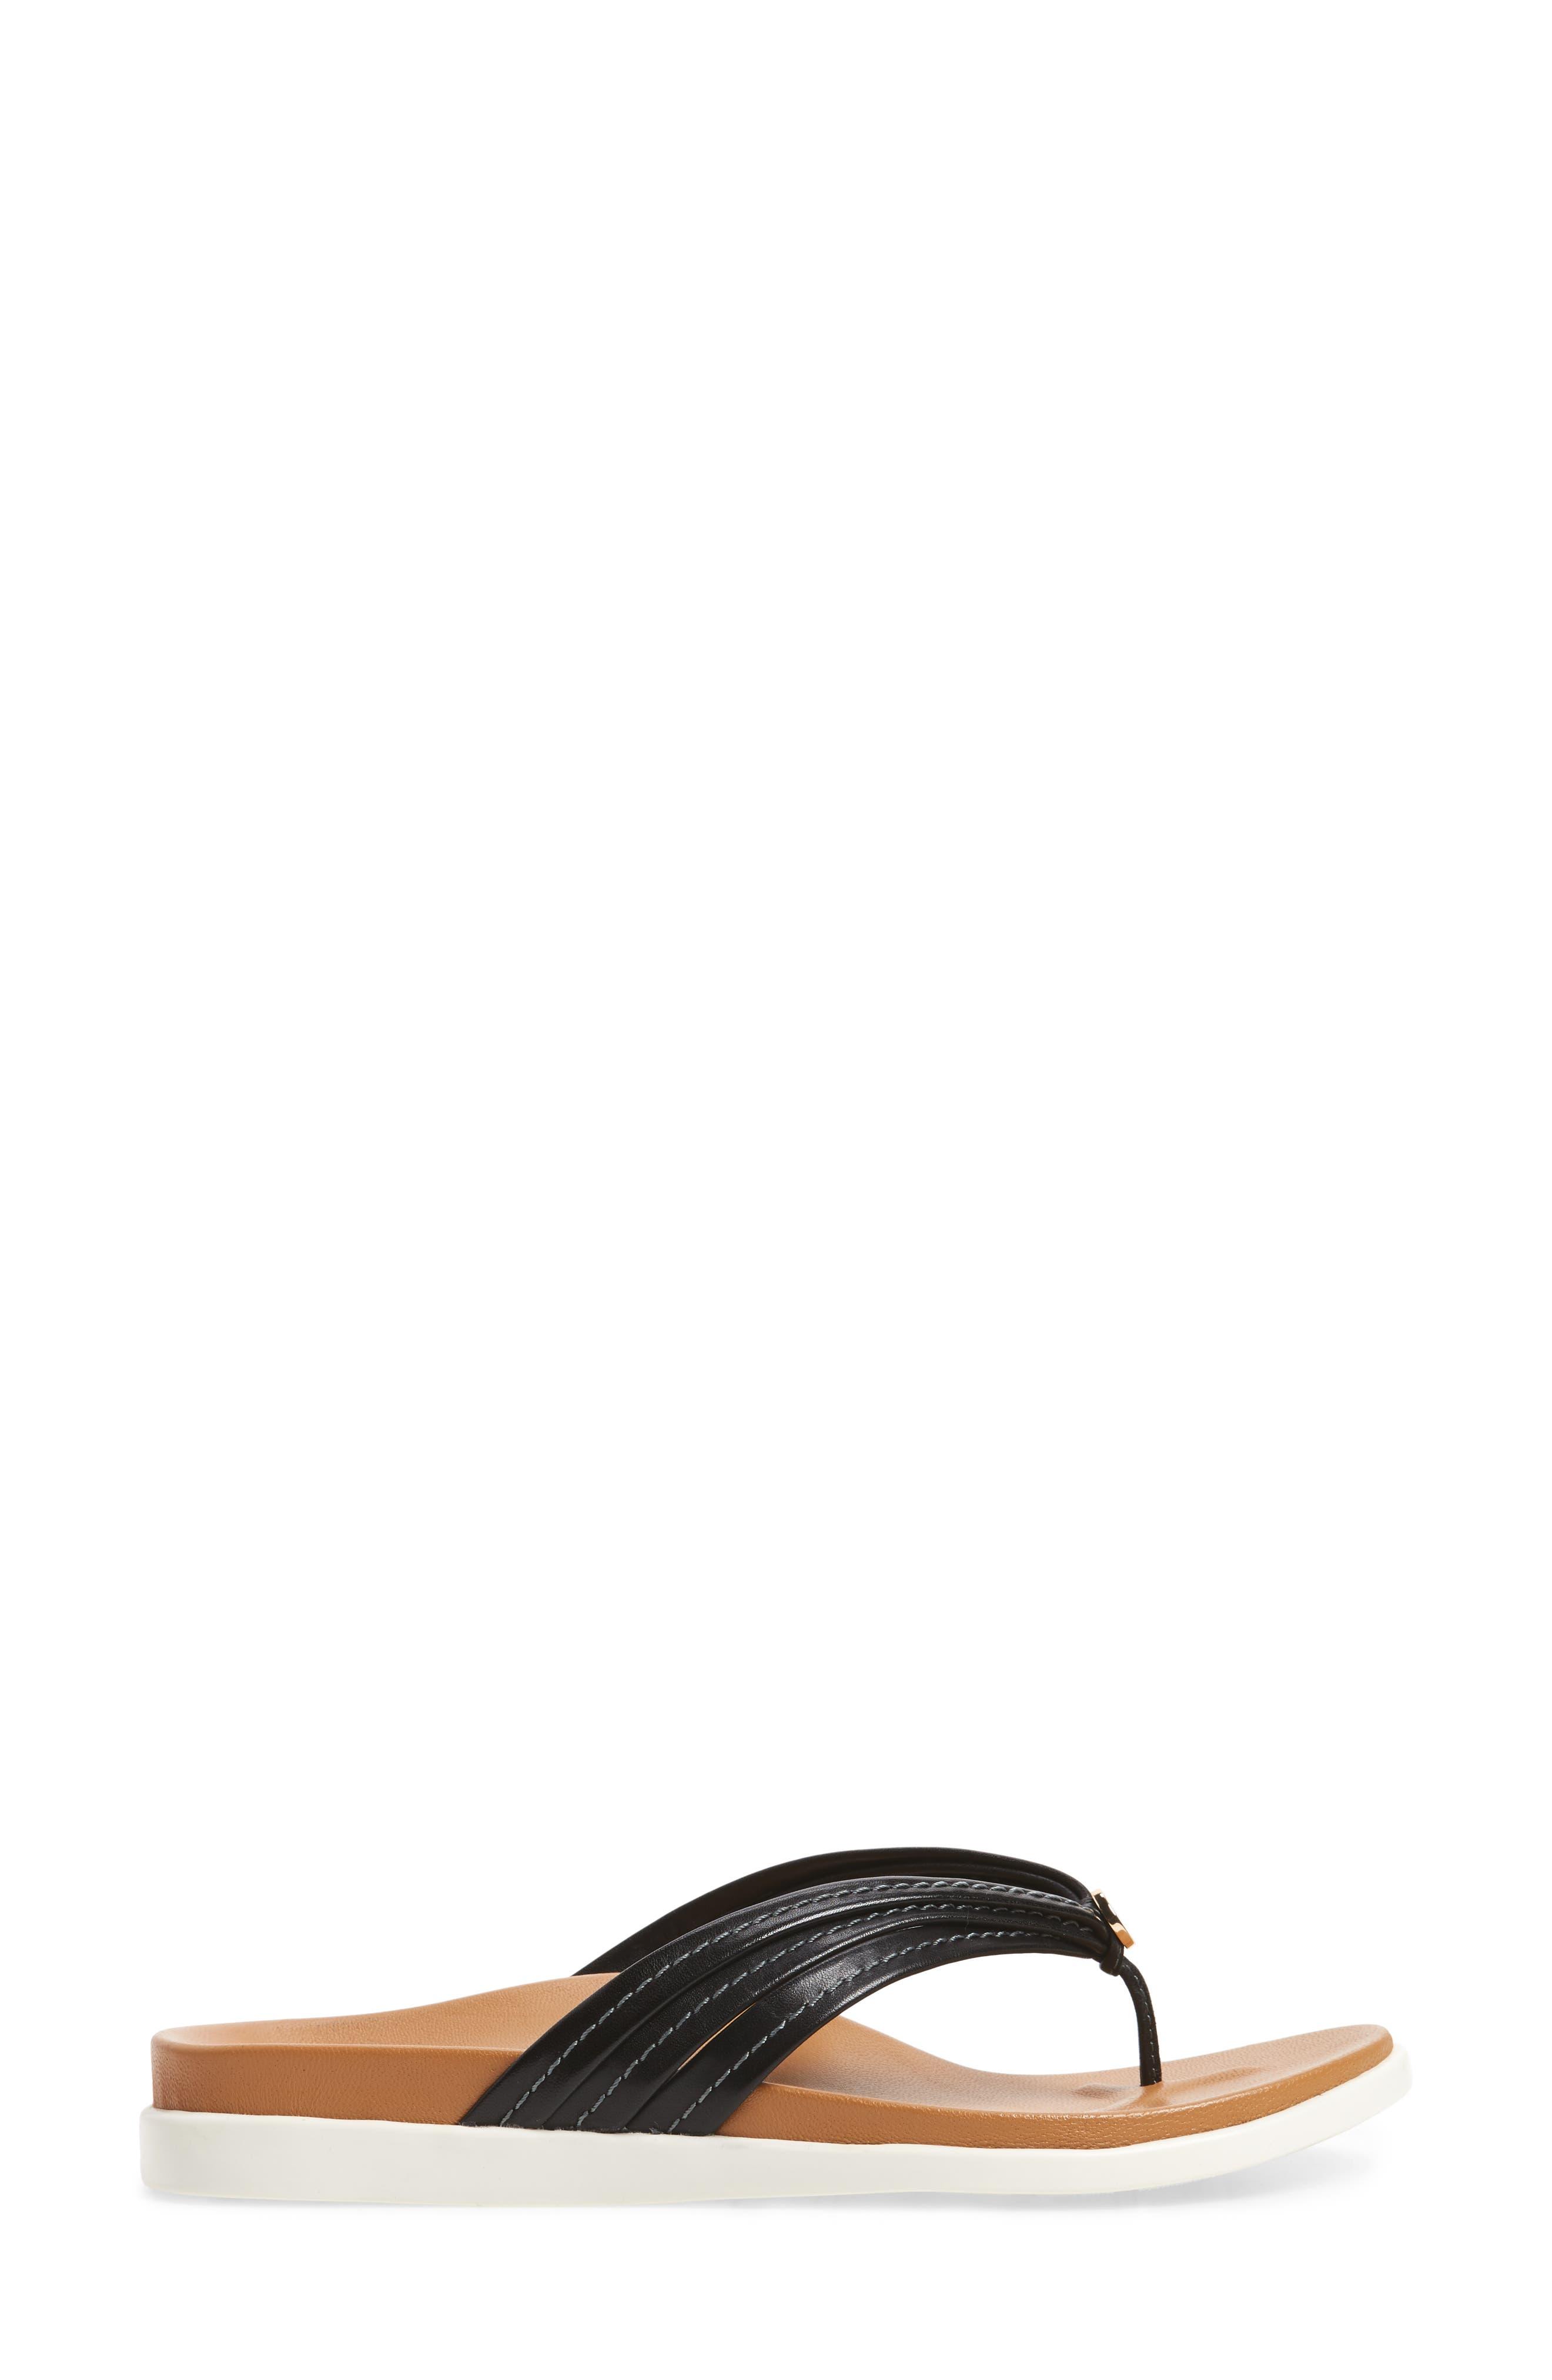 Catalina Flip Flop,                             Alternate thumbnail 5, color,                             Black Leather